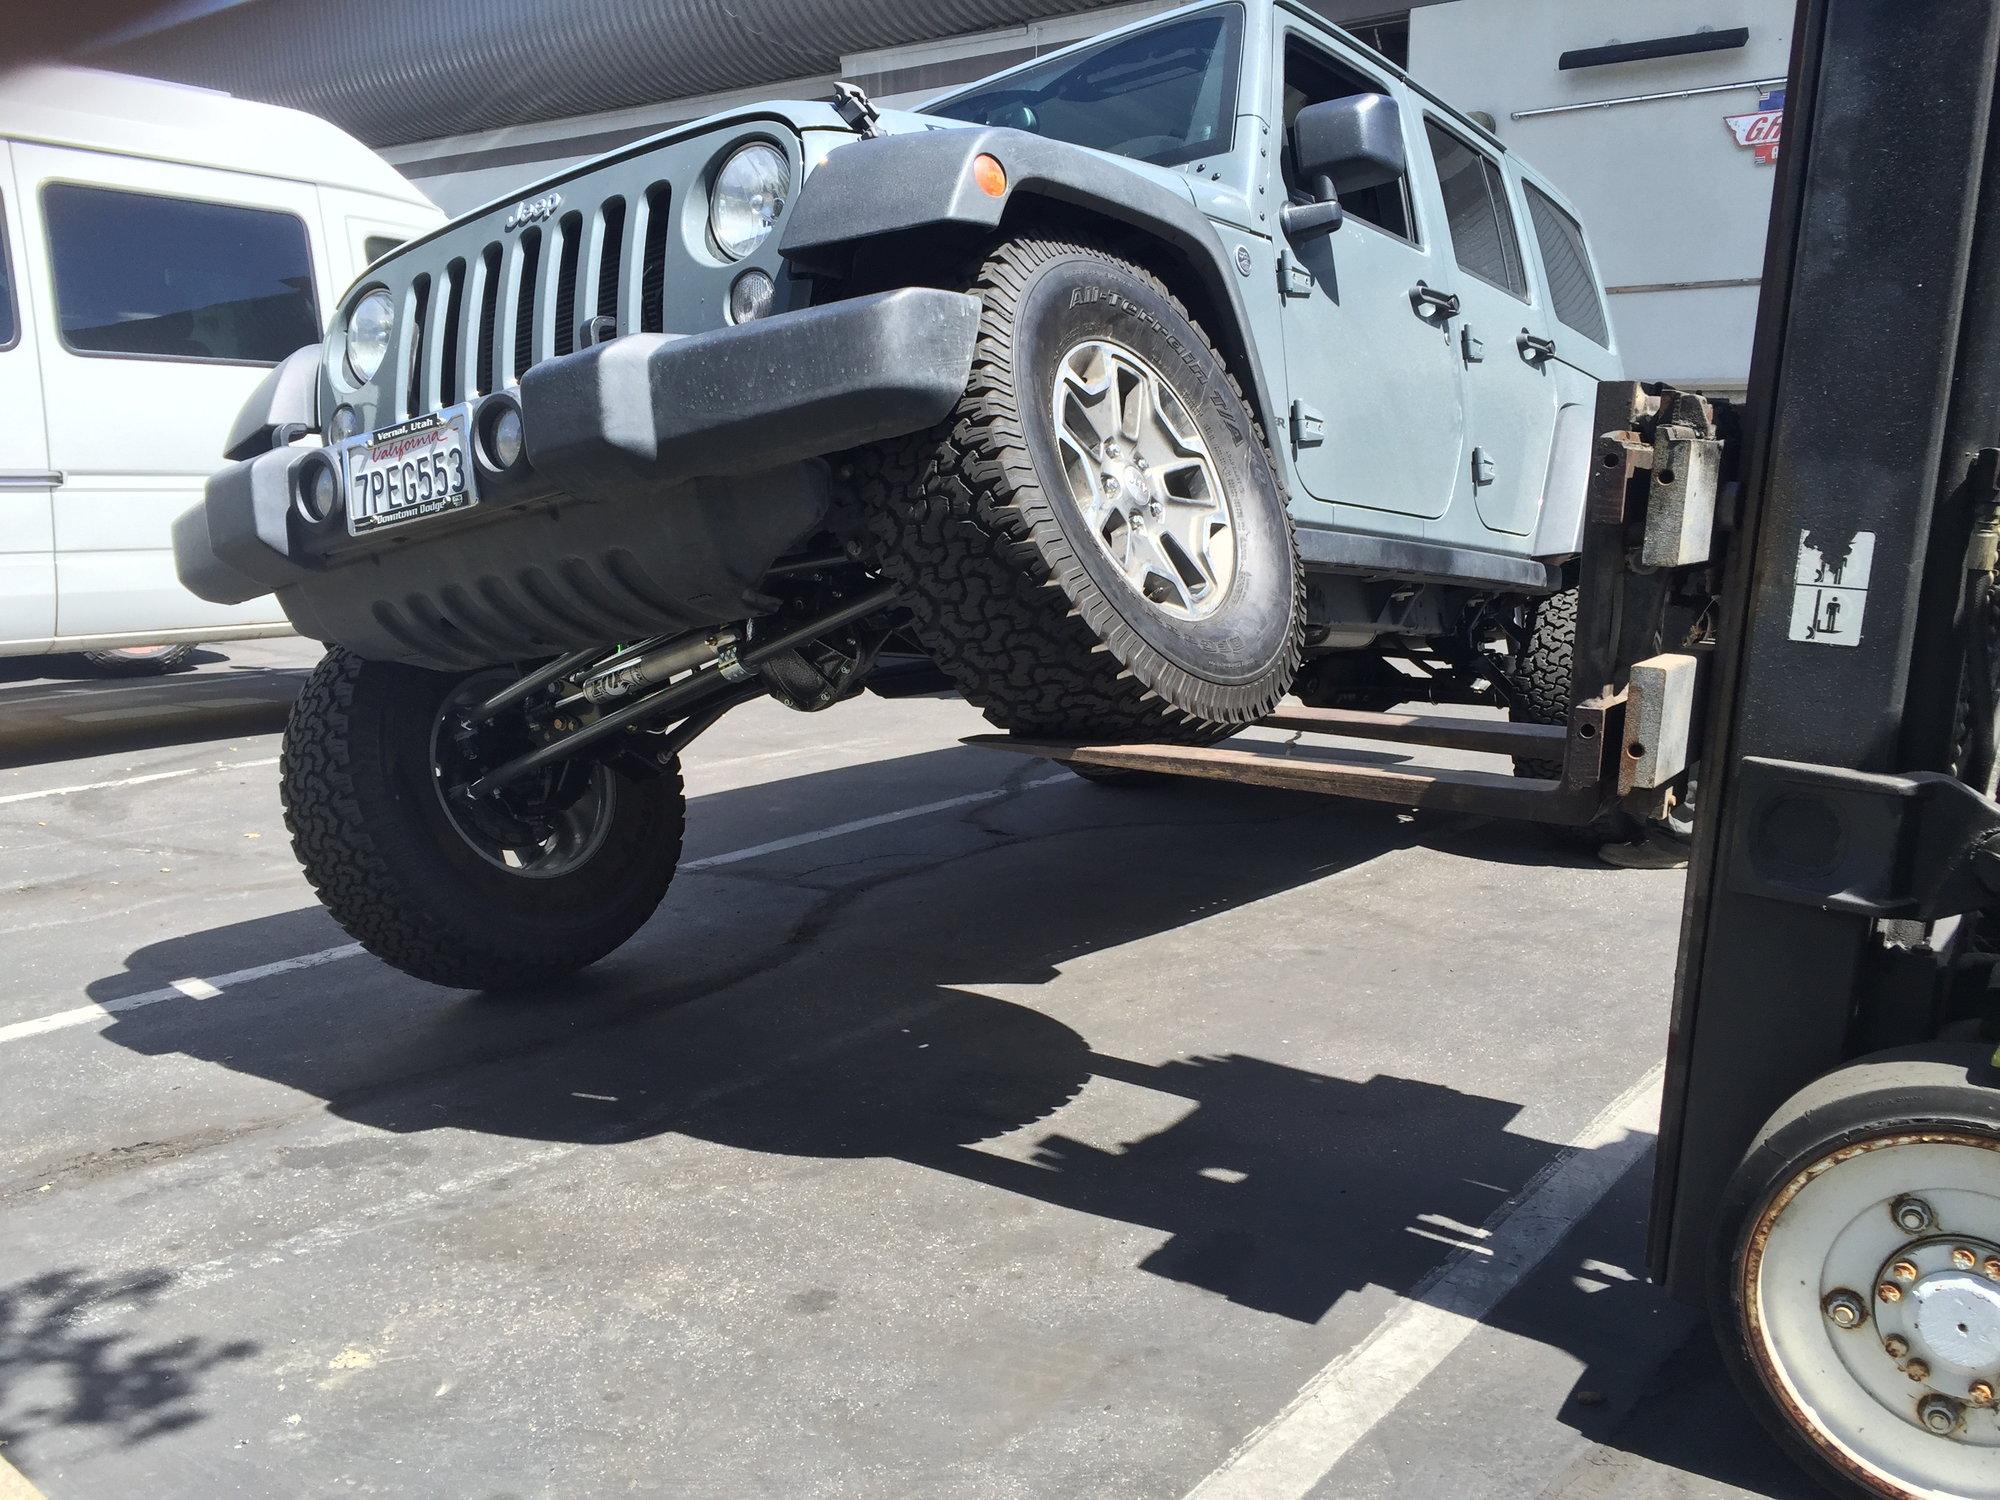 2014 Jeep Wrangler Rubicon Unlimited, 6spd, 16k miles - JK